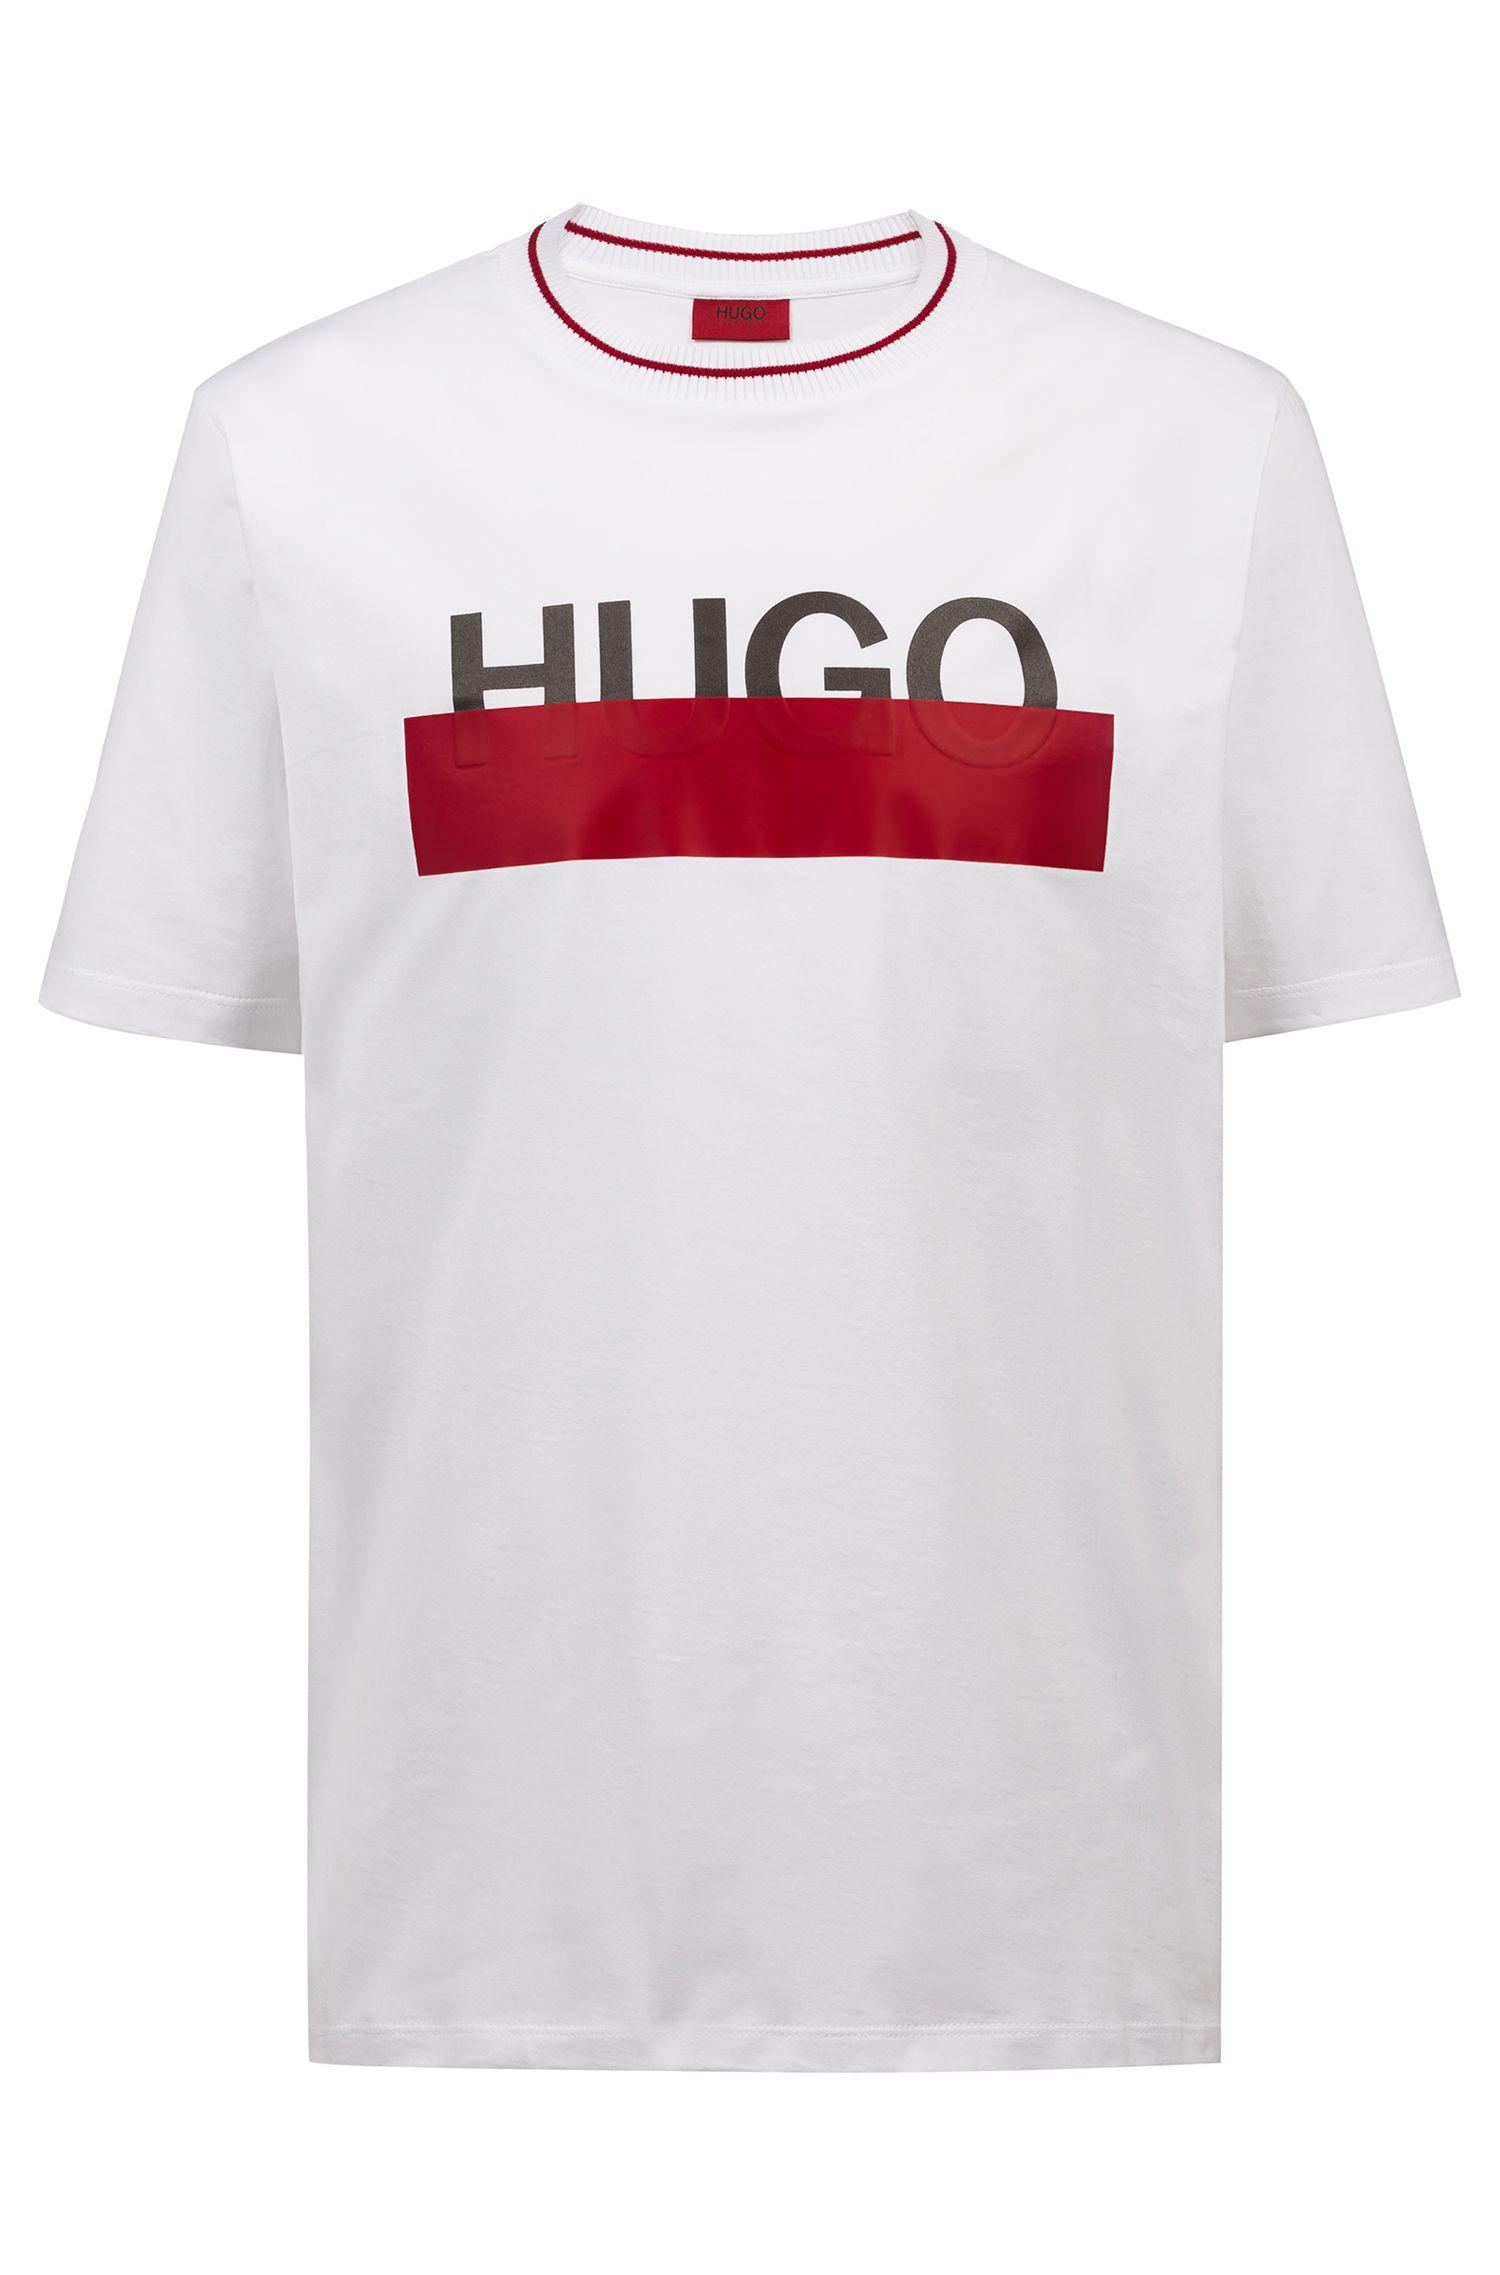 Hugo Boss - T-Shirt aus Baumwolle mit teilweise verdecktem Logo - 1